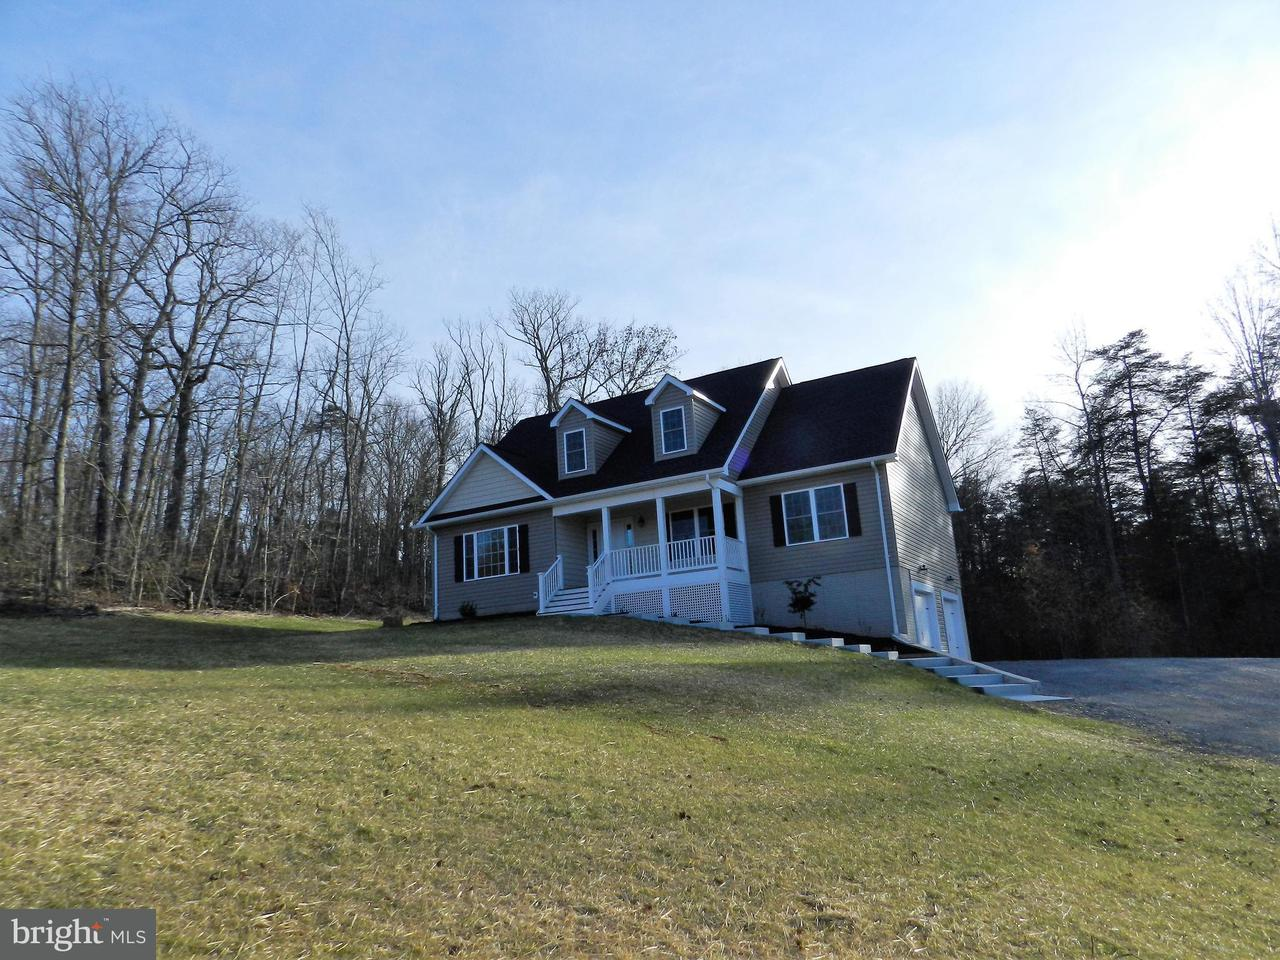 Single Family Home for Sale at SARAHS WAY SARAHS WAY Culpeper, Virginia 22701 United States